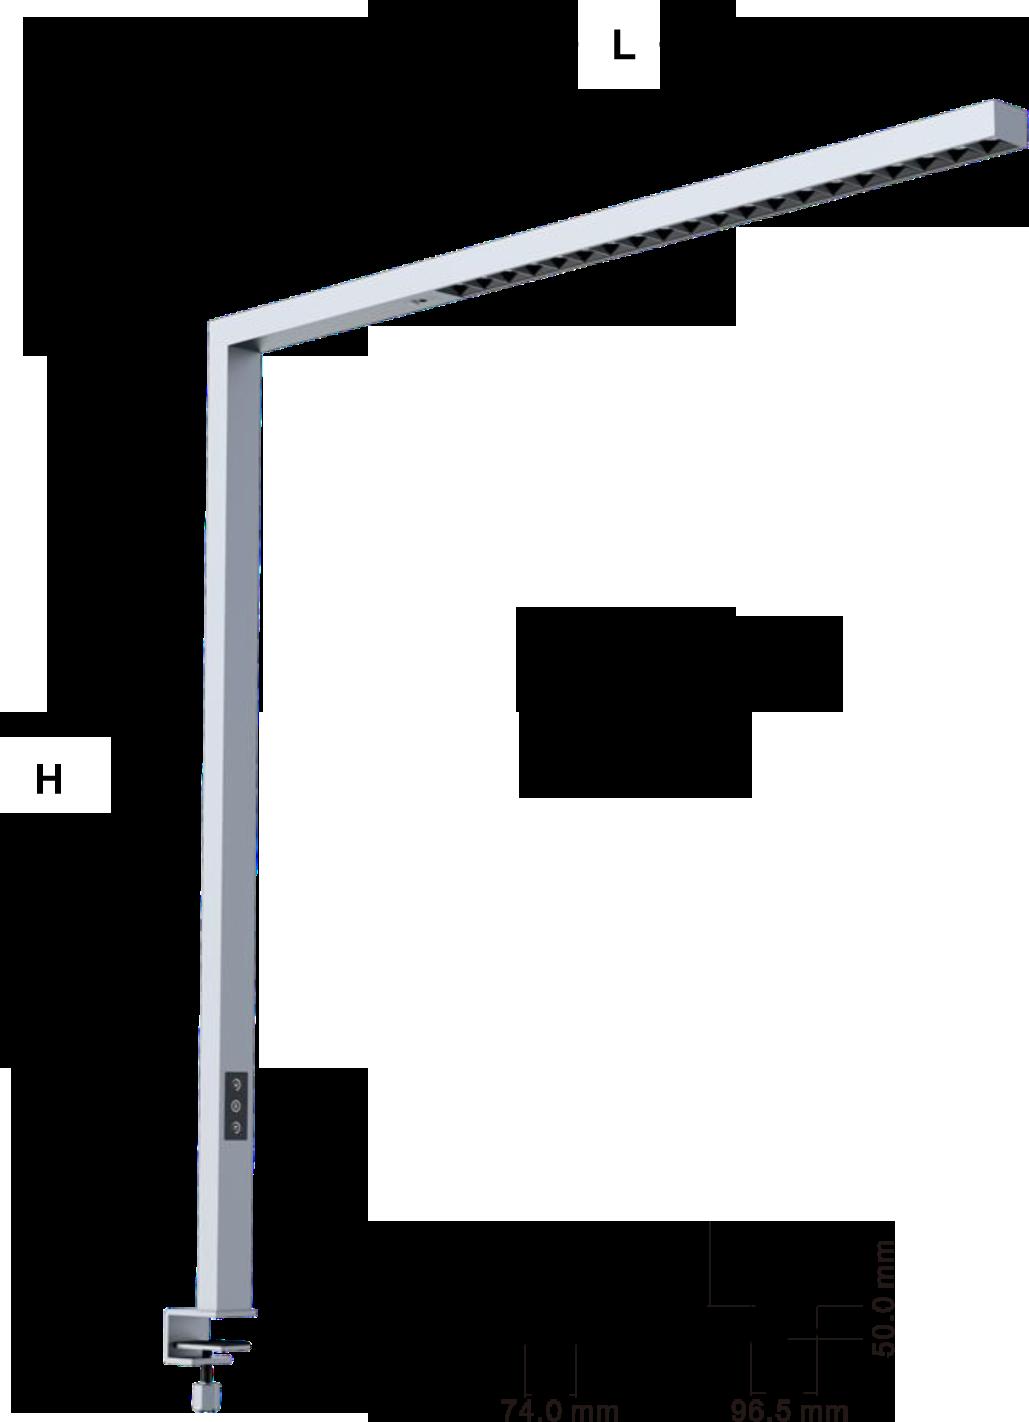 LEDAXO LED-Arbeitsplatzleuchte AL-08 Abmessungen